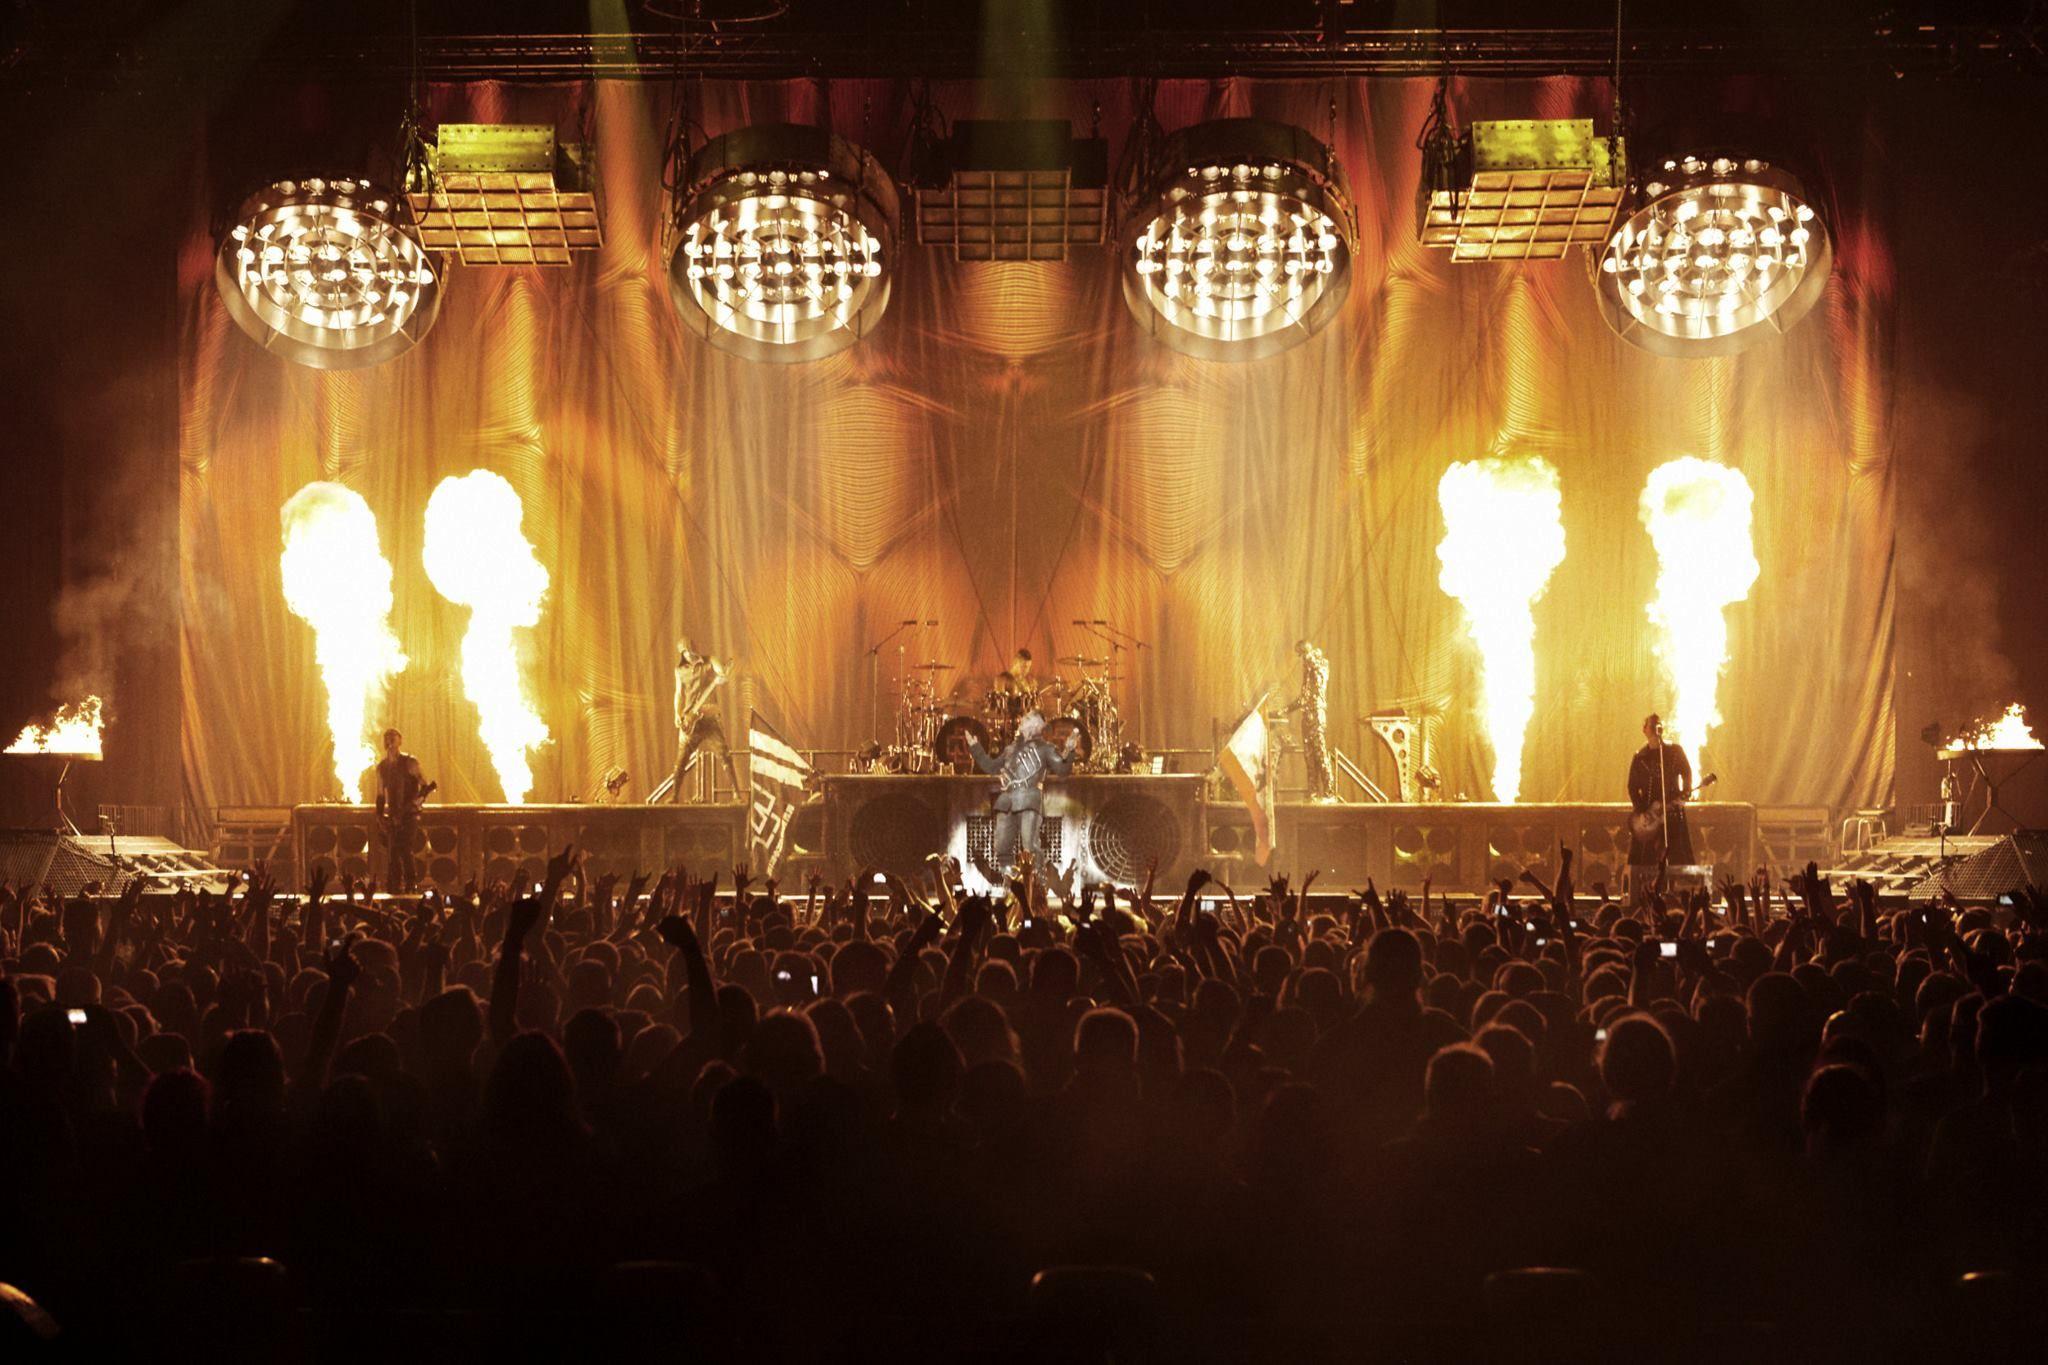 Rammstein Rammstein Industrial Metal Heavy Concert